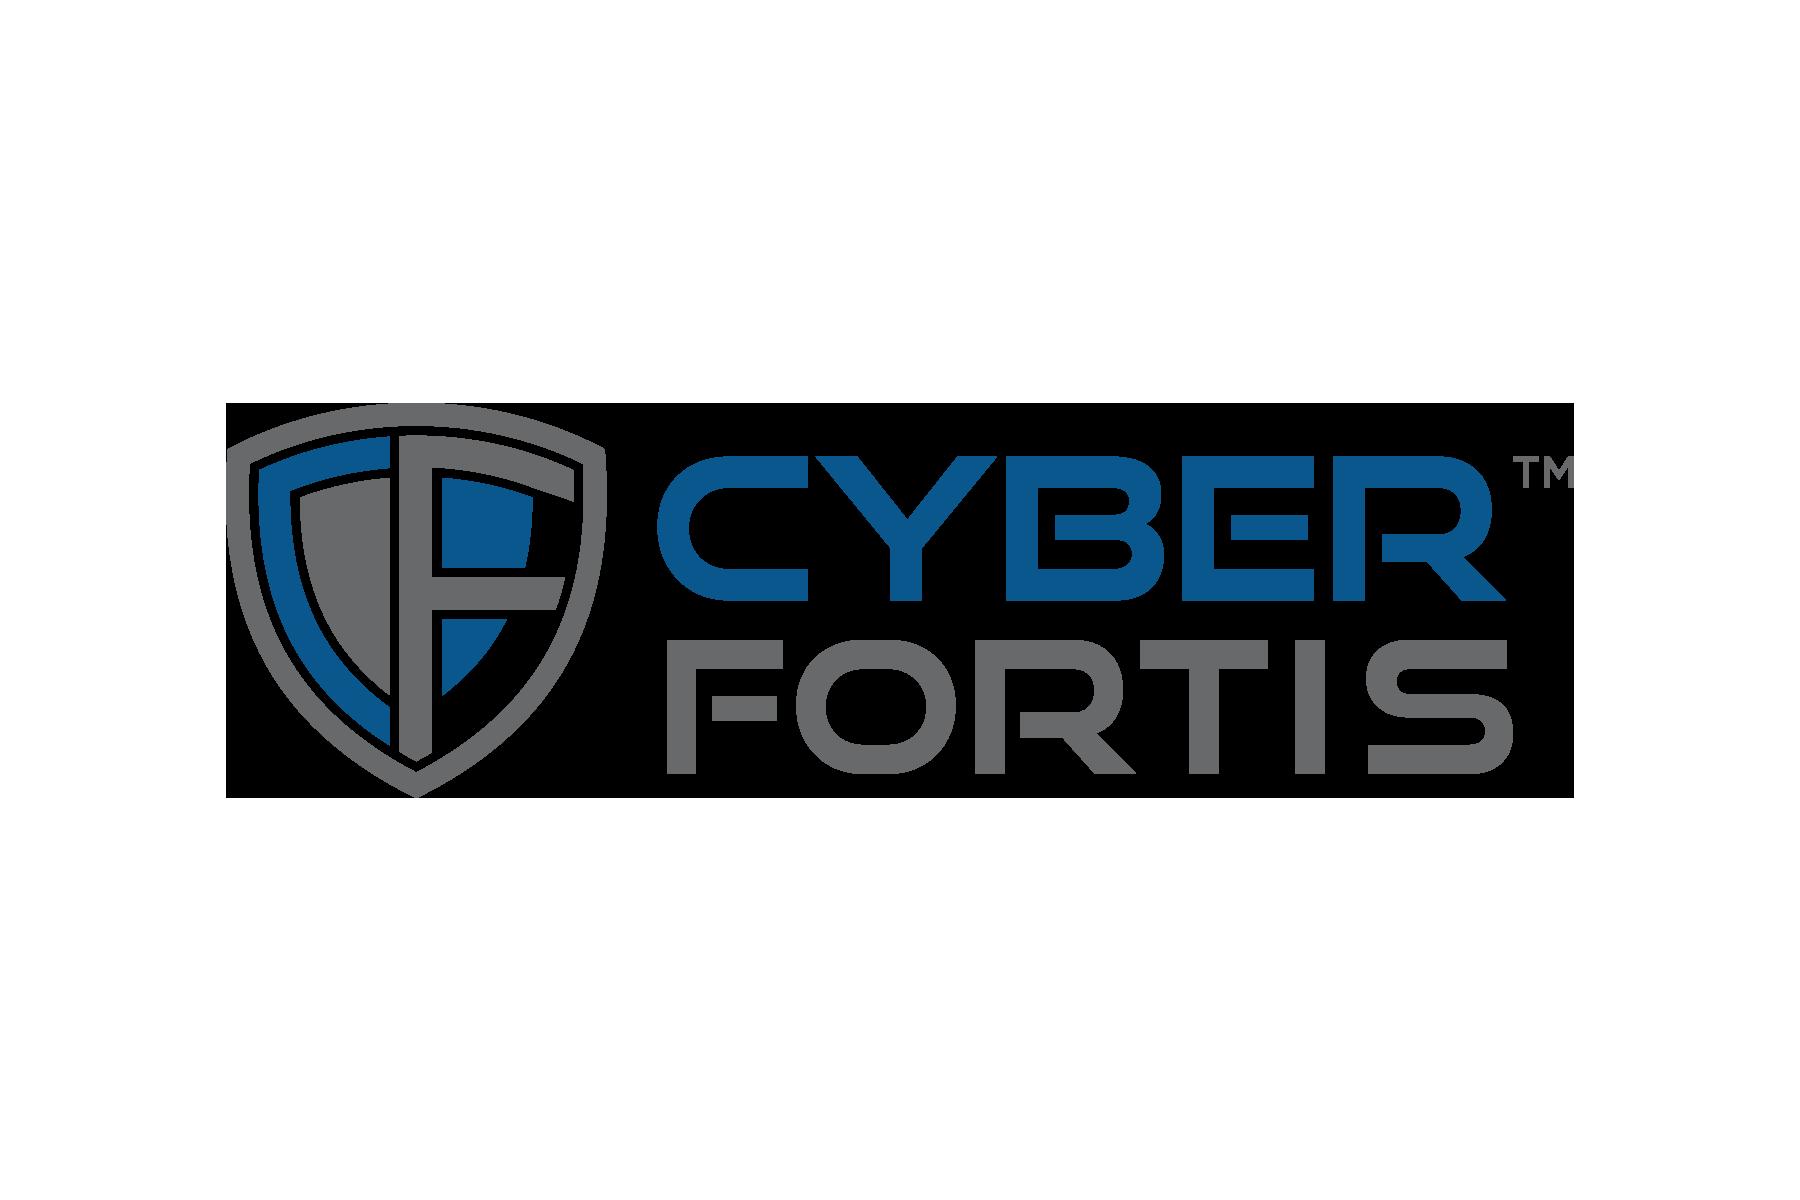 cyberfortis_f